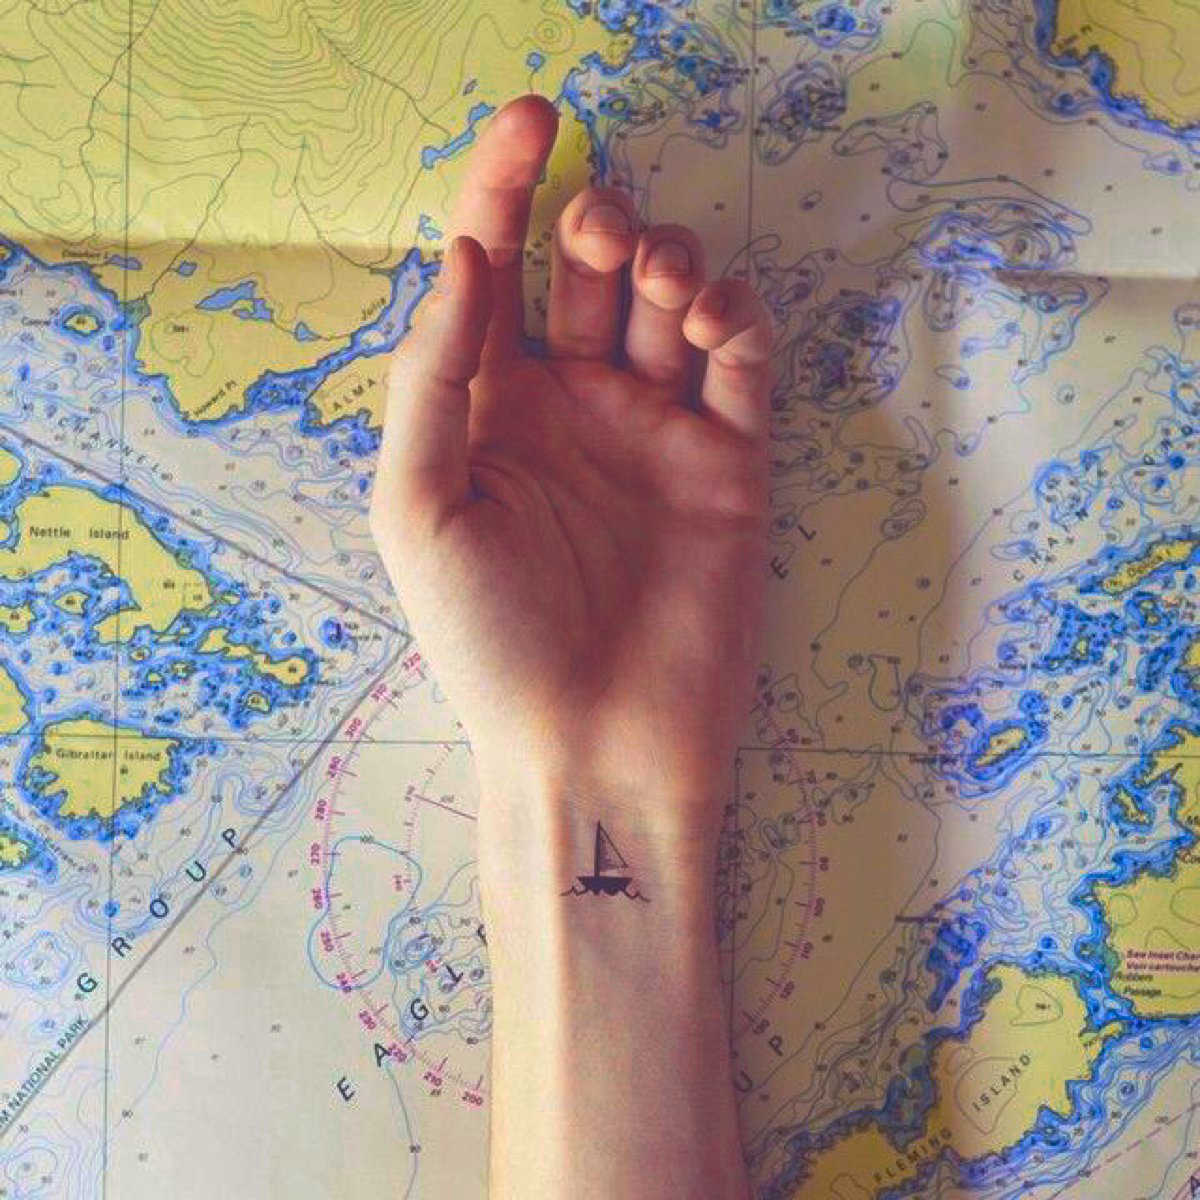 20 Tatuajes Pequenos Pero Con Un Gran Significado